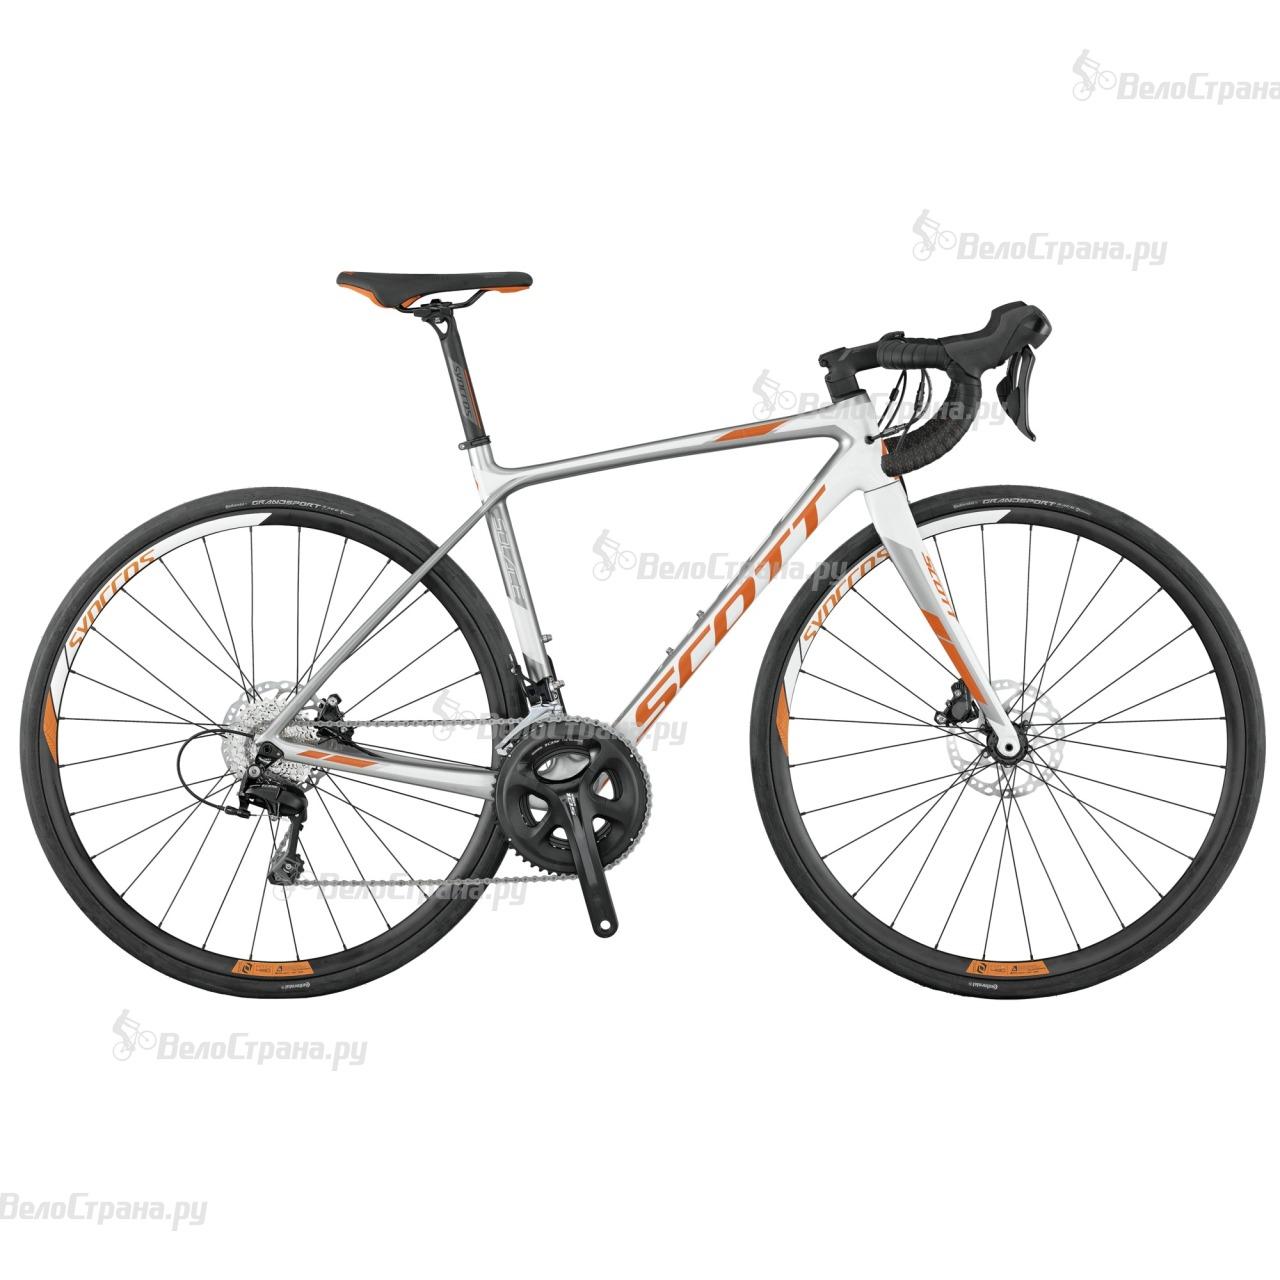 Велосипед Scott Contessa Solace 25 disc (2017) велосипед scott contessa solace 15 compact 2015